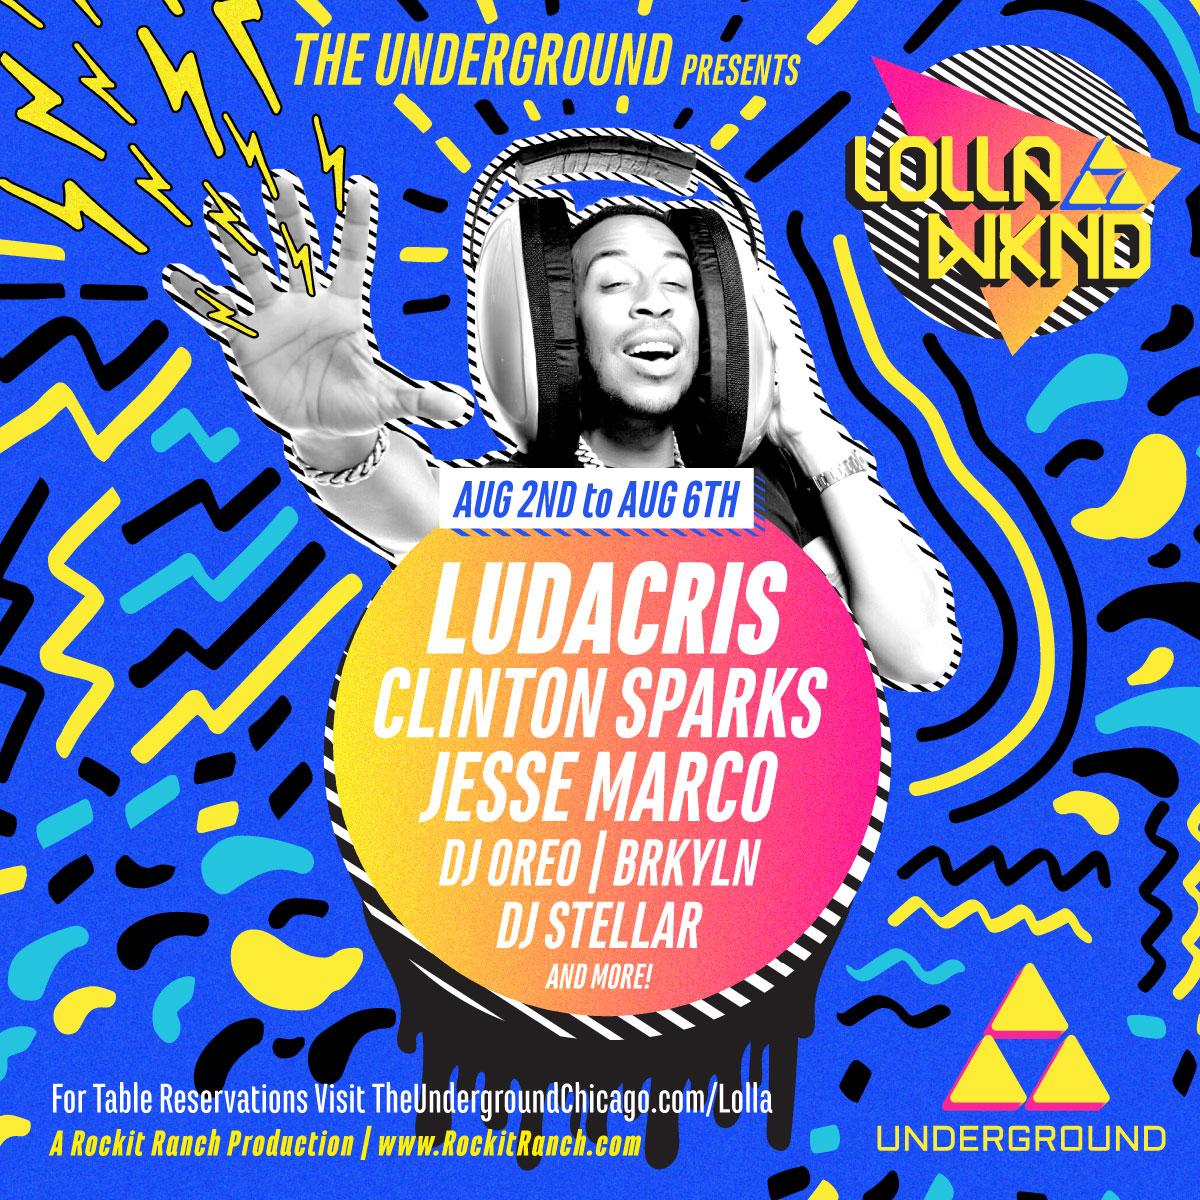 Lolla Wknd with Ludacris